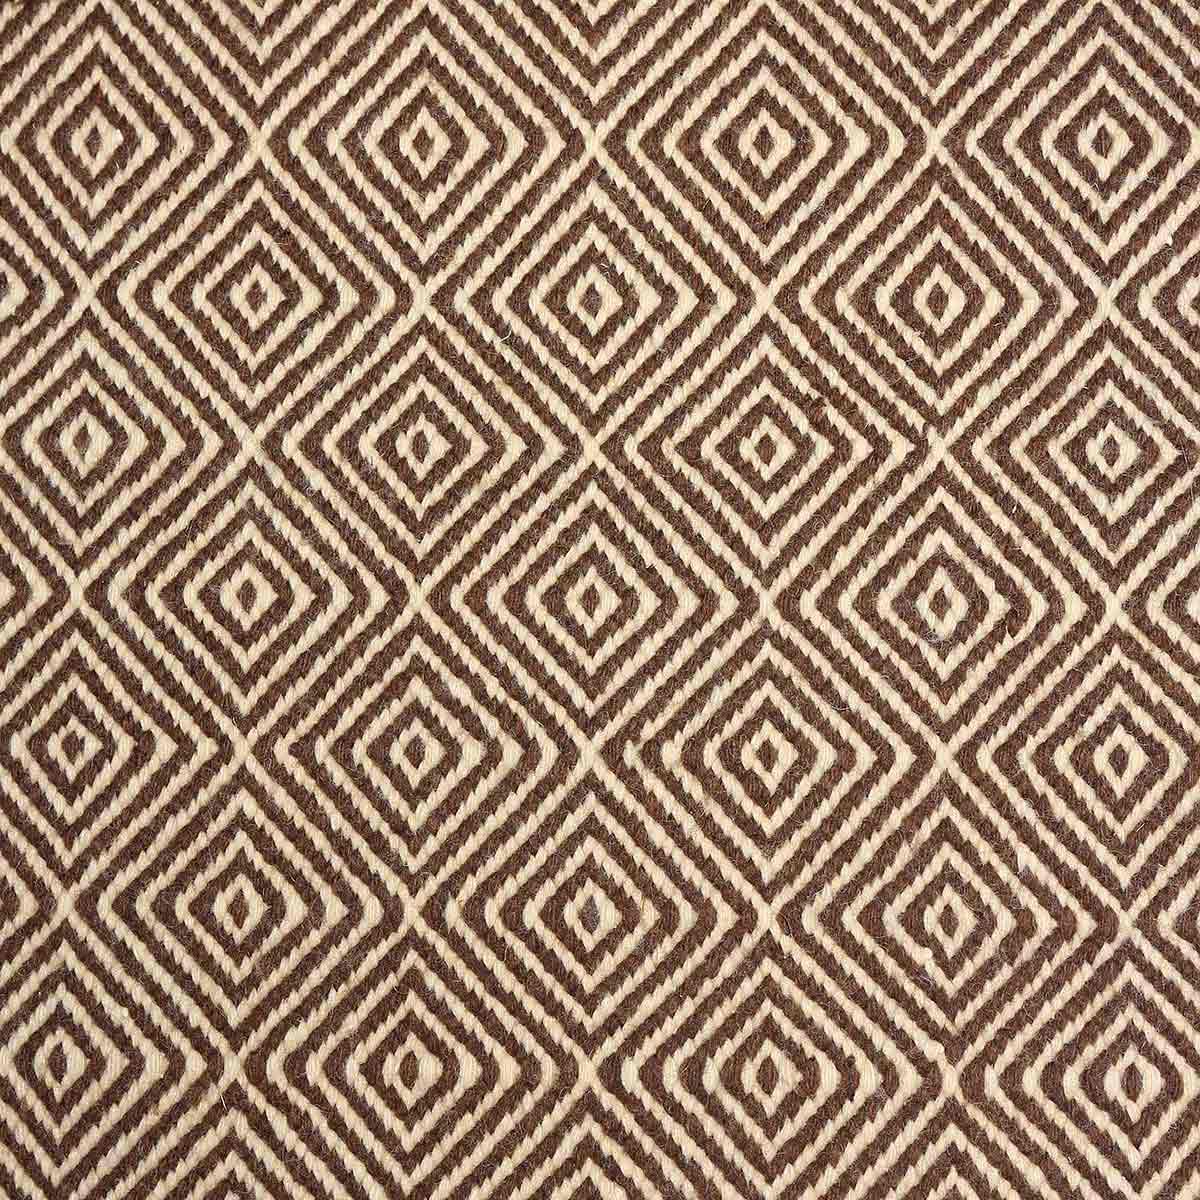 Pangborne  Wool  Carpets  Collection  Tim Page Carpets